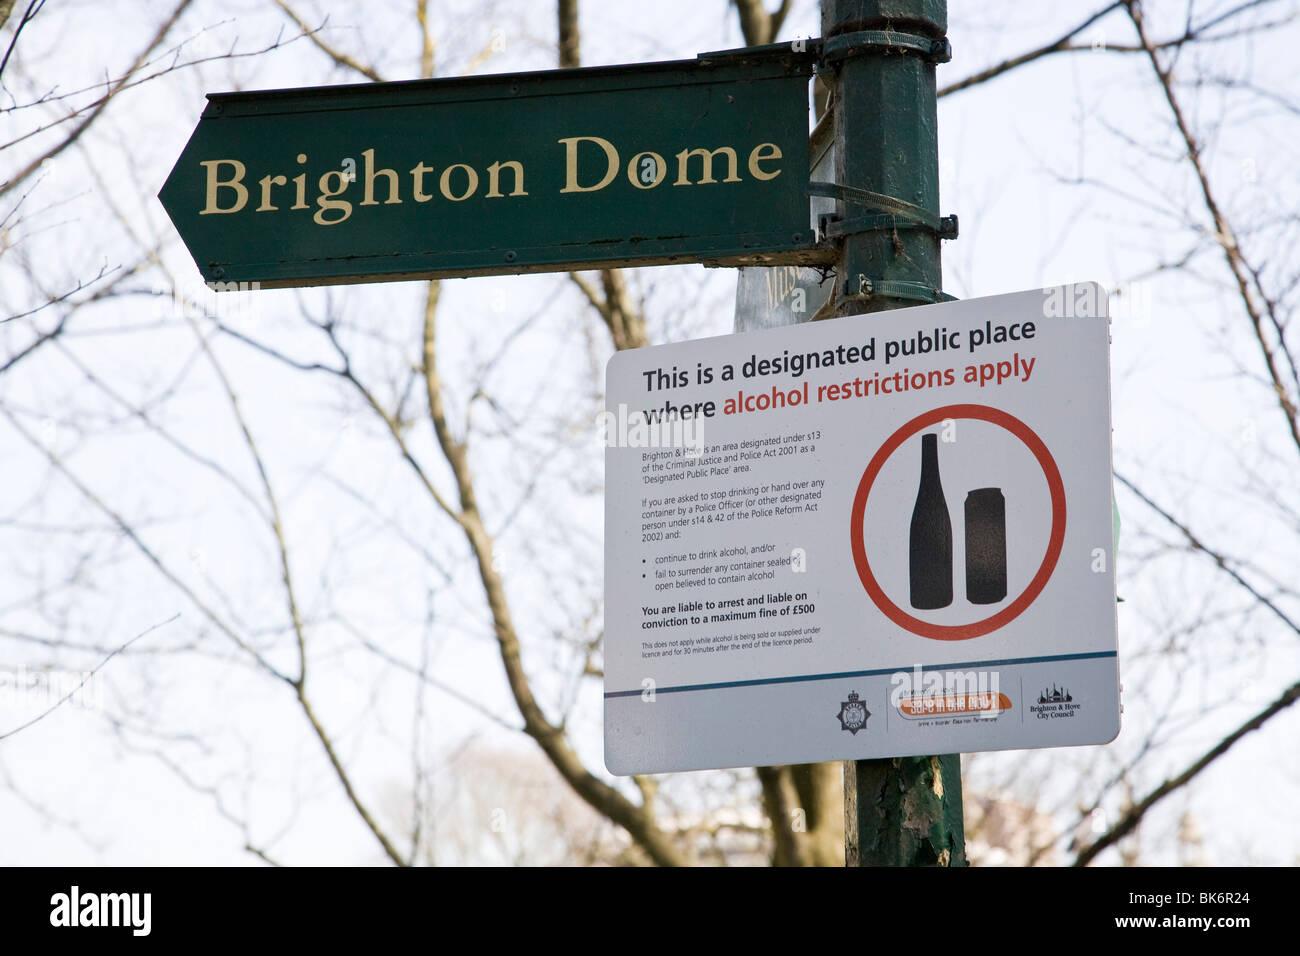 Restriction d'alcool Brighton Brighton Dome signe dans les jardins. Photo Stock